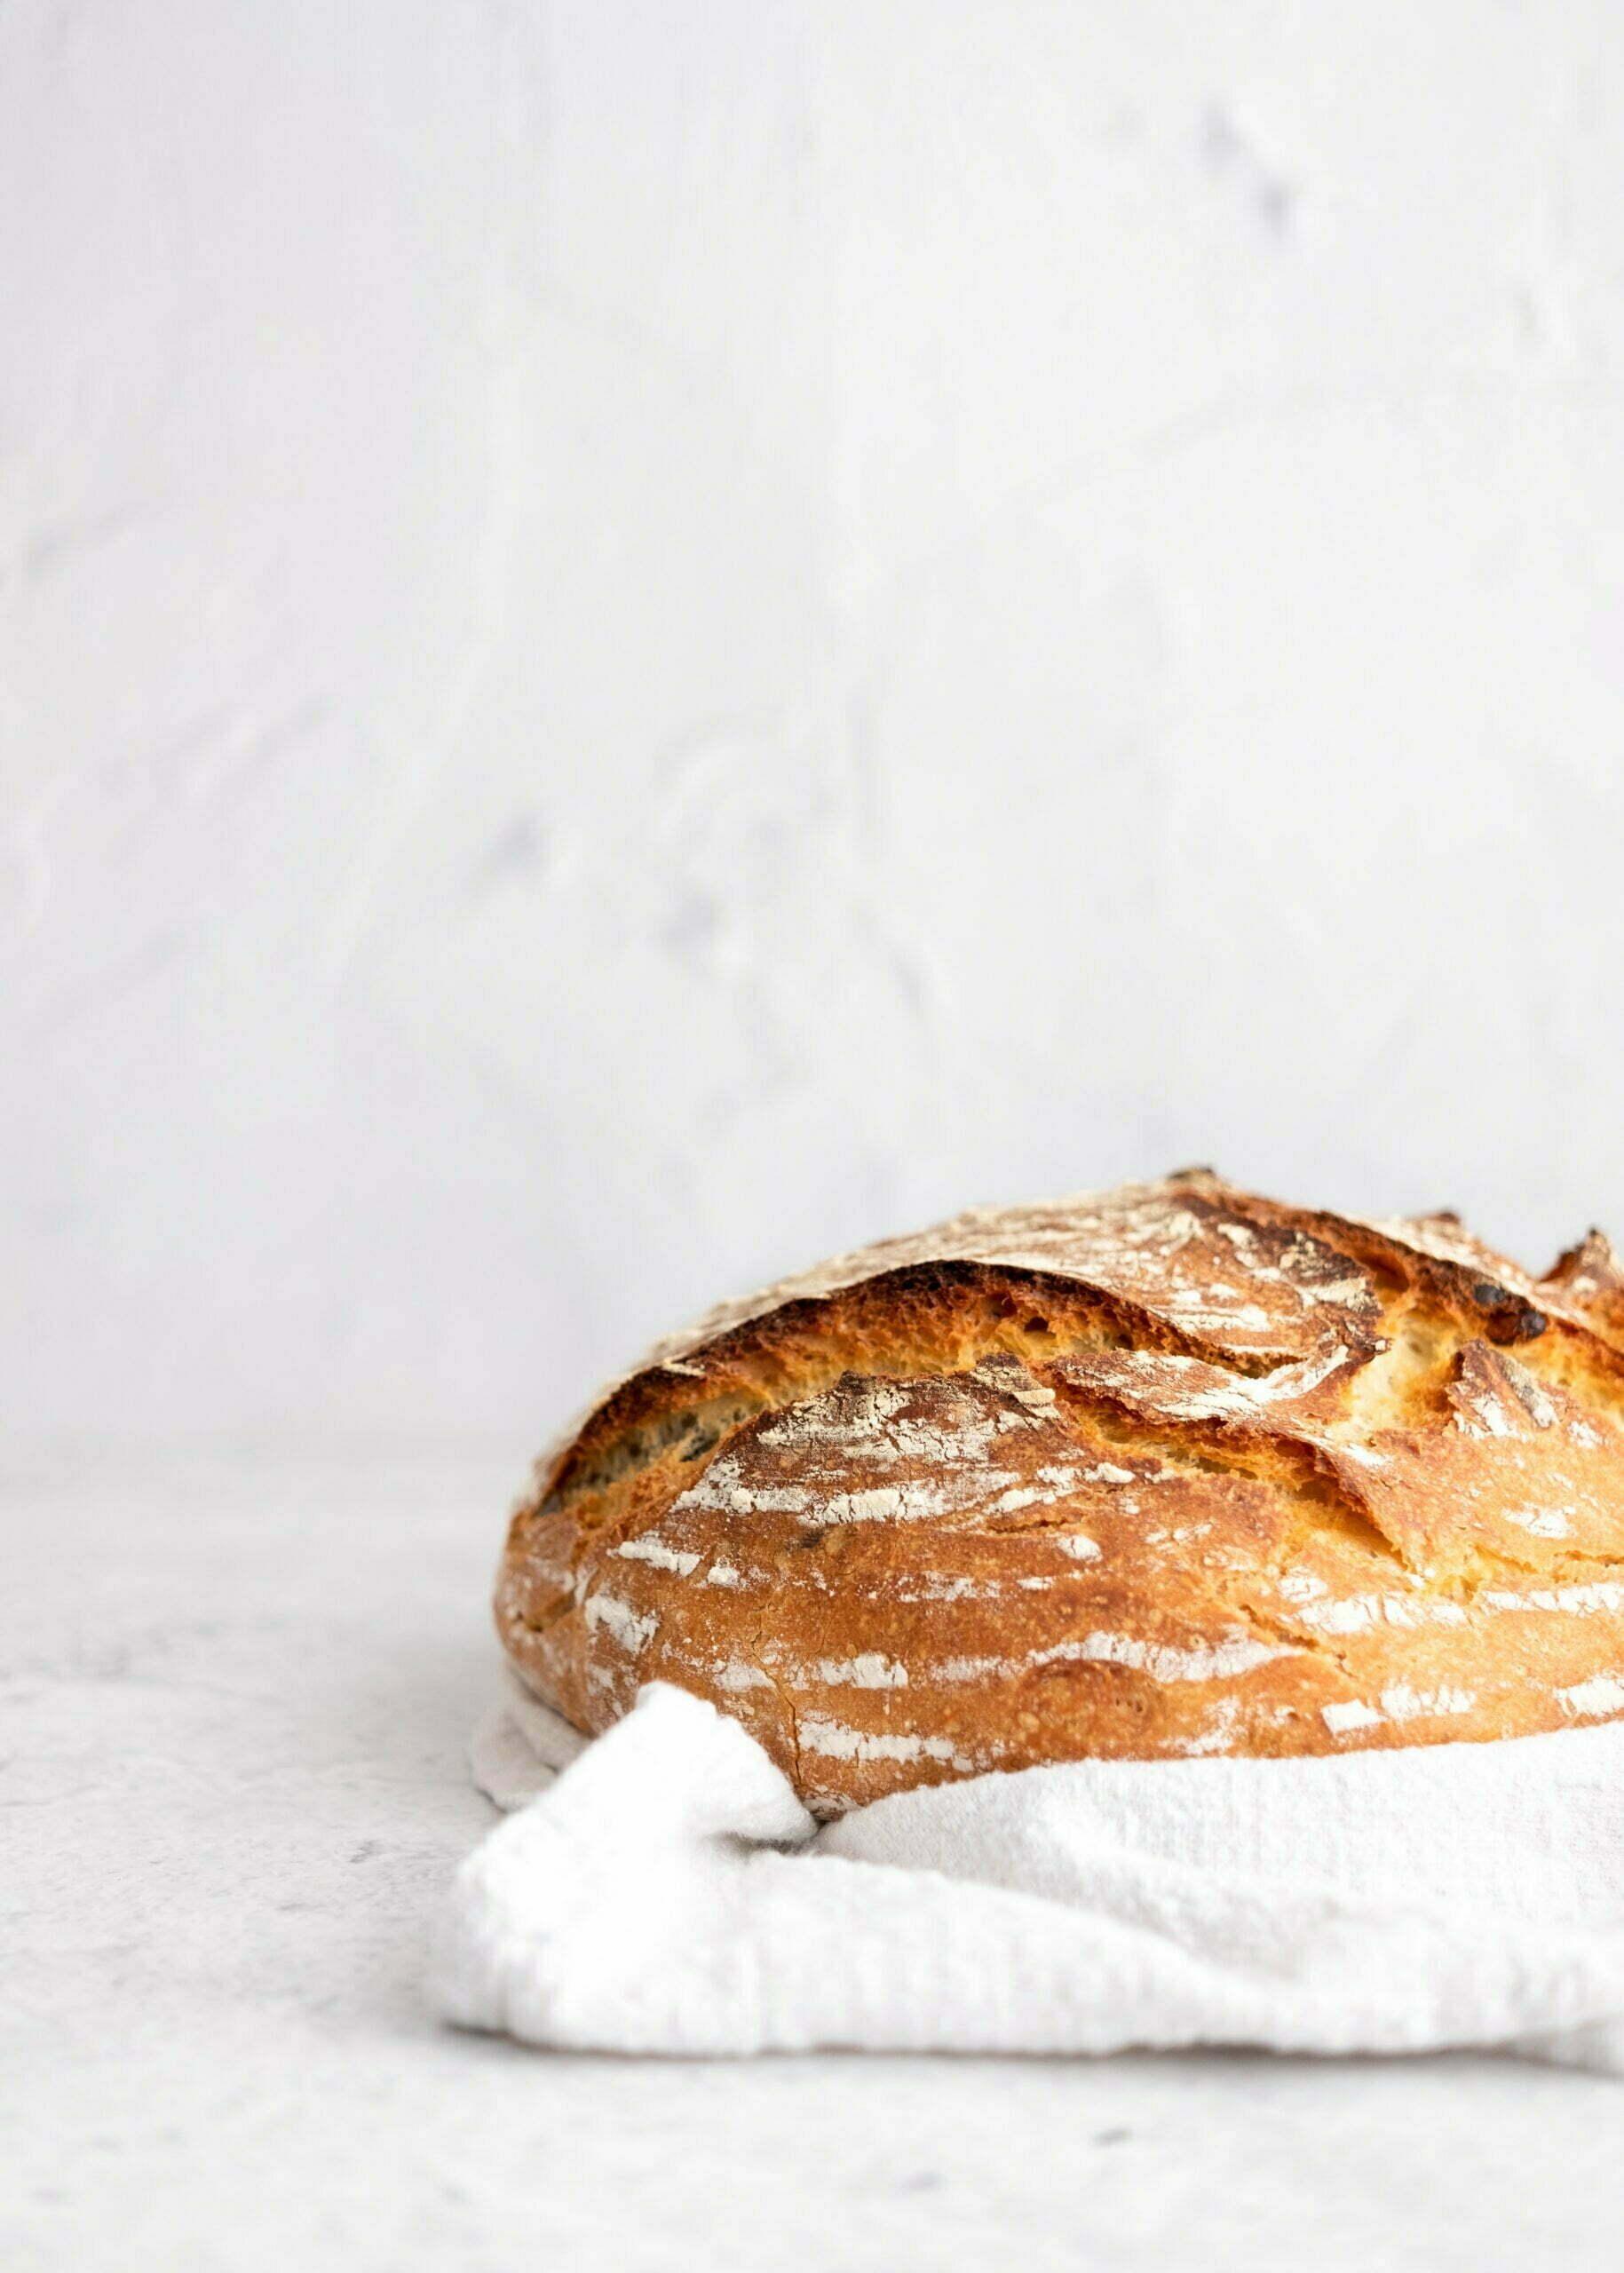 Pšenični durum kruh brez gnetenja